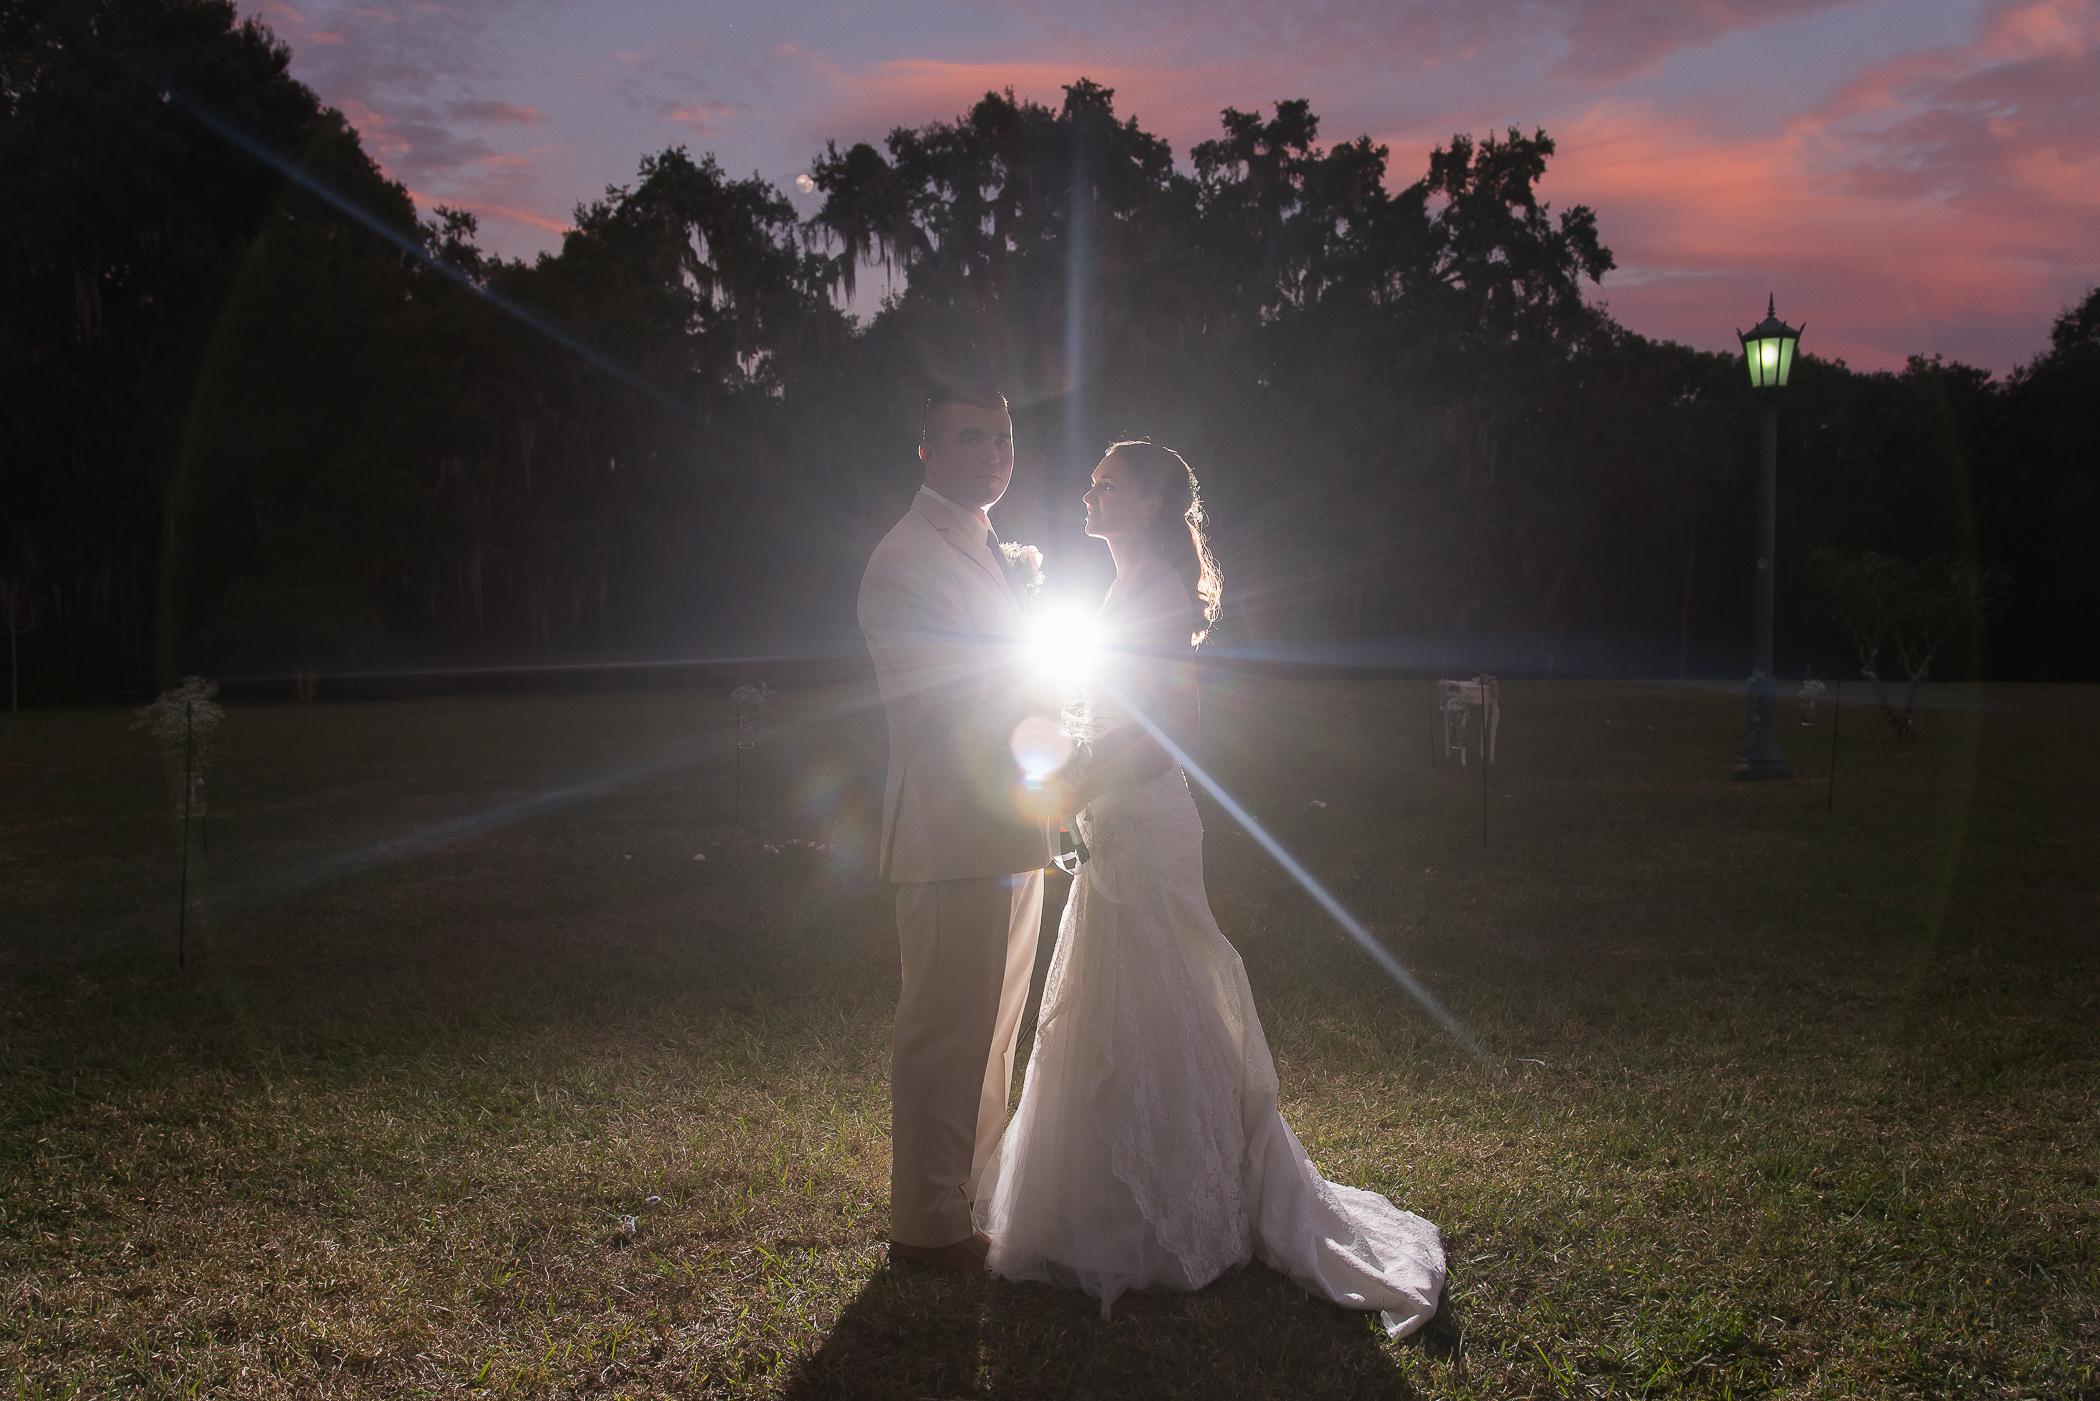 Tampa wedding photographer, Tampa wedding videographer, Tampa weddings, Tampa photographer, Tampa videographer